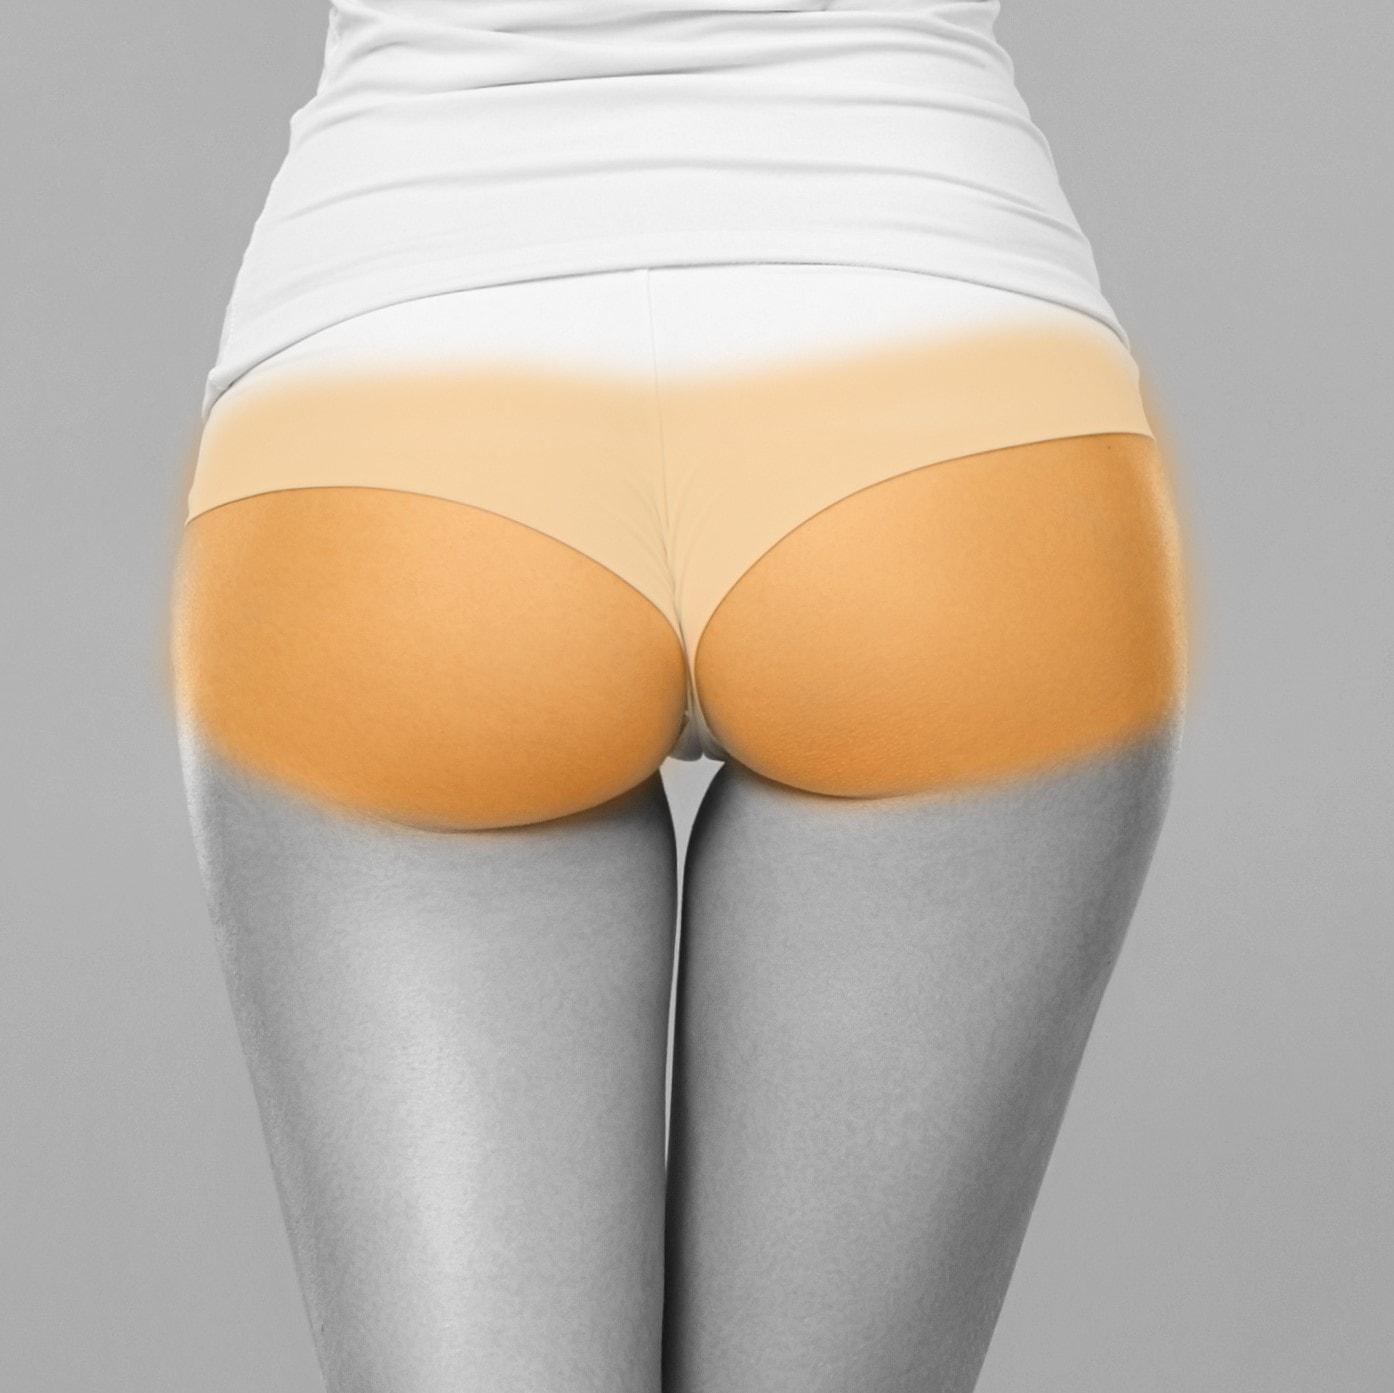 buttocks laser hair removal ashford kent